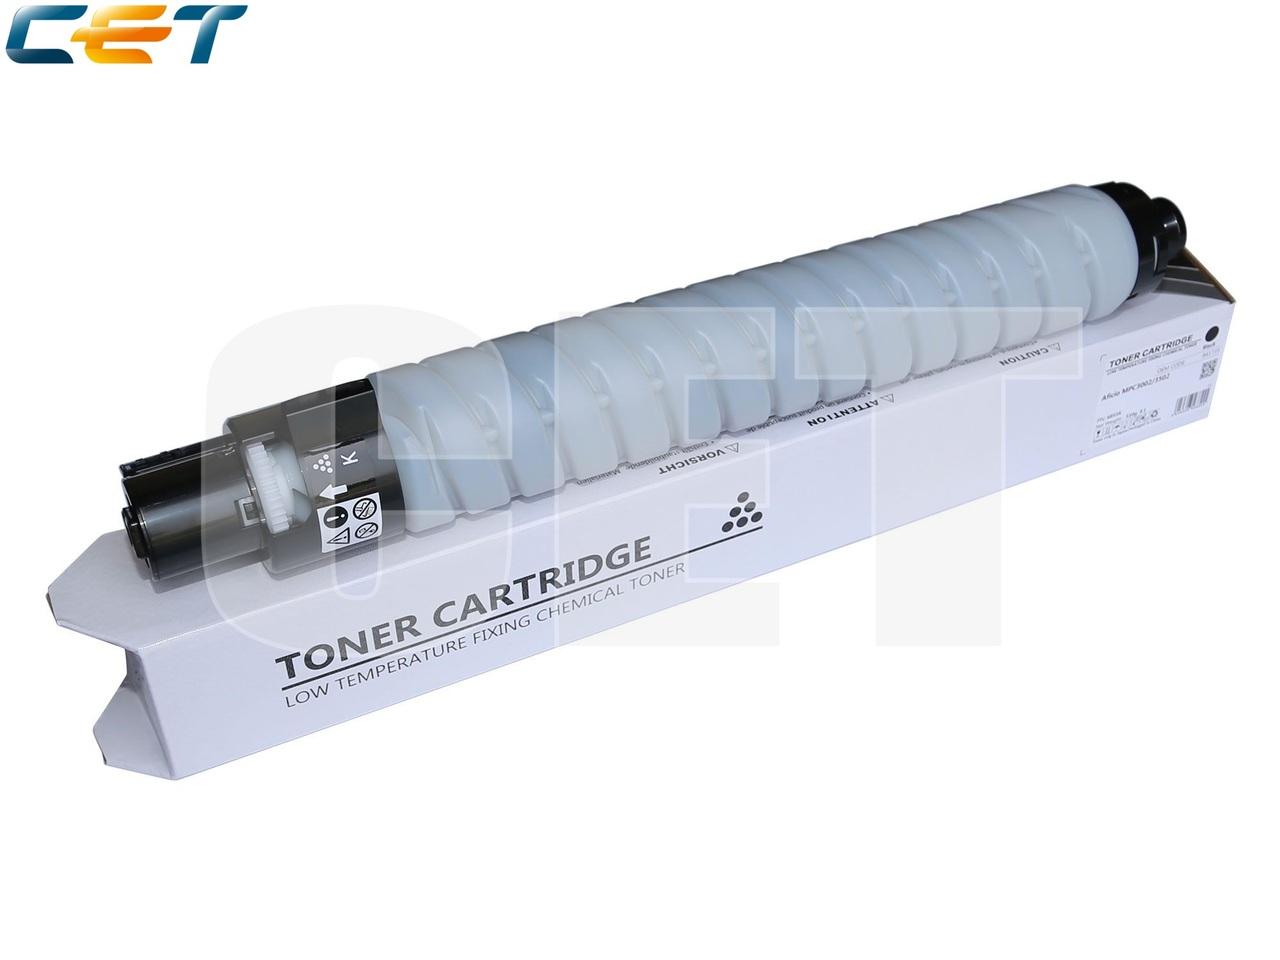 Тонер-картридж (CPT) 841651, 842016 для RICOH AficioMPC3002/3502 (CET) Black, (WW), 510г, 28000 стр., CET6855K